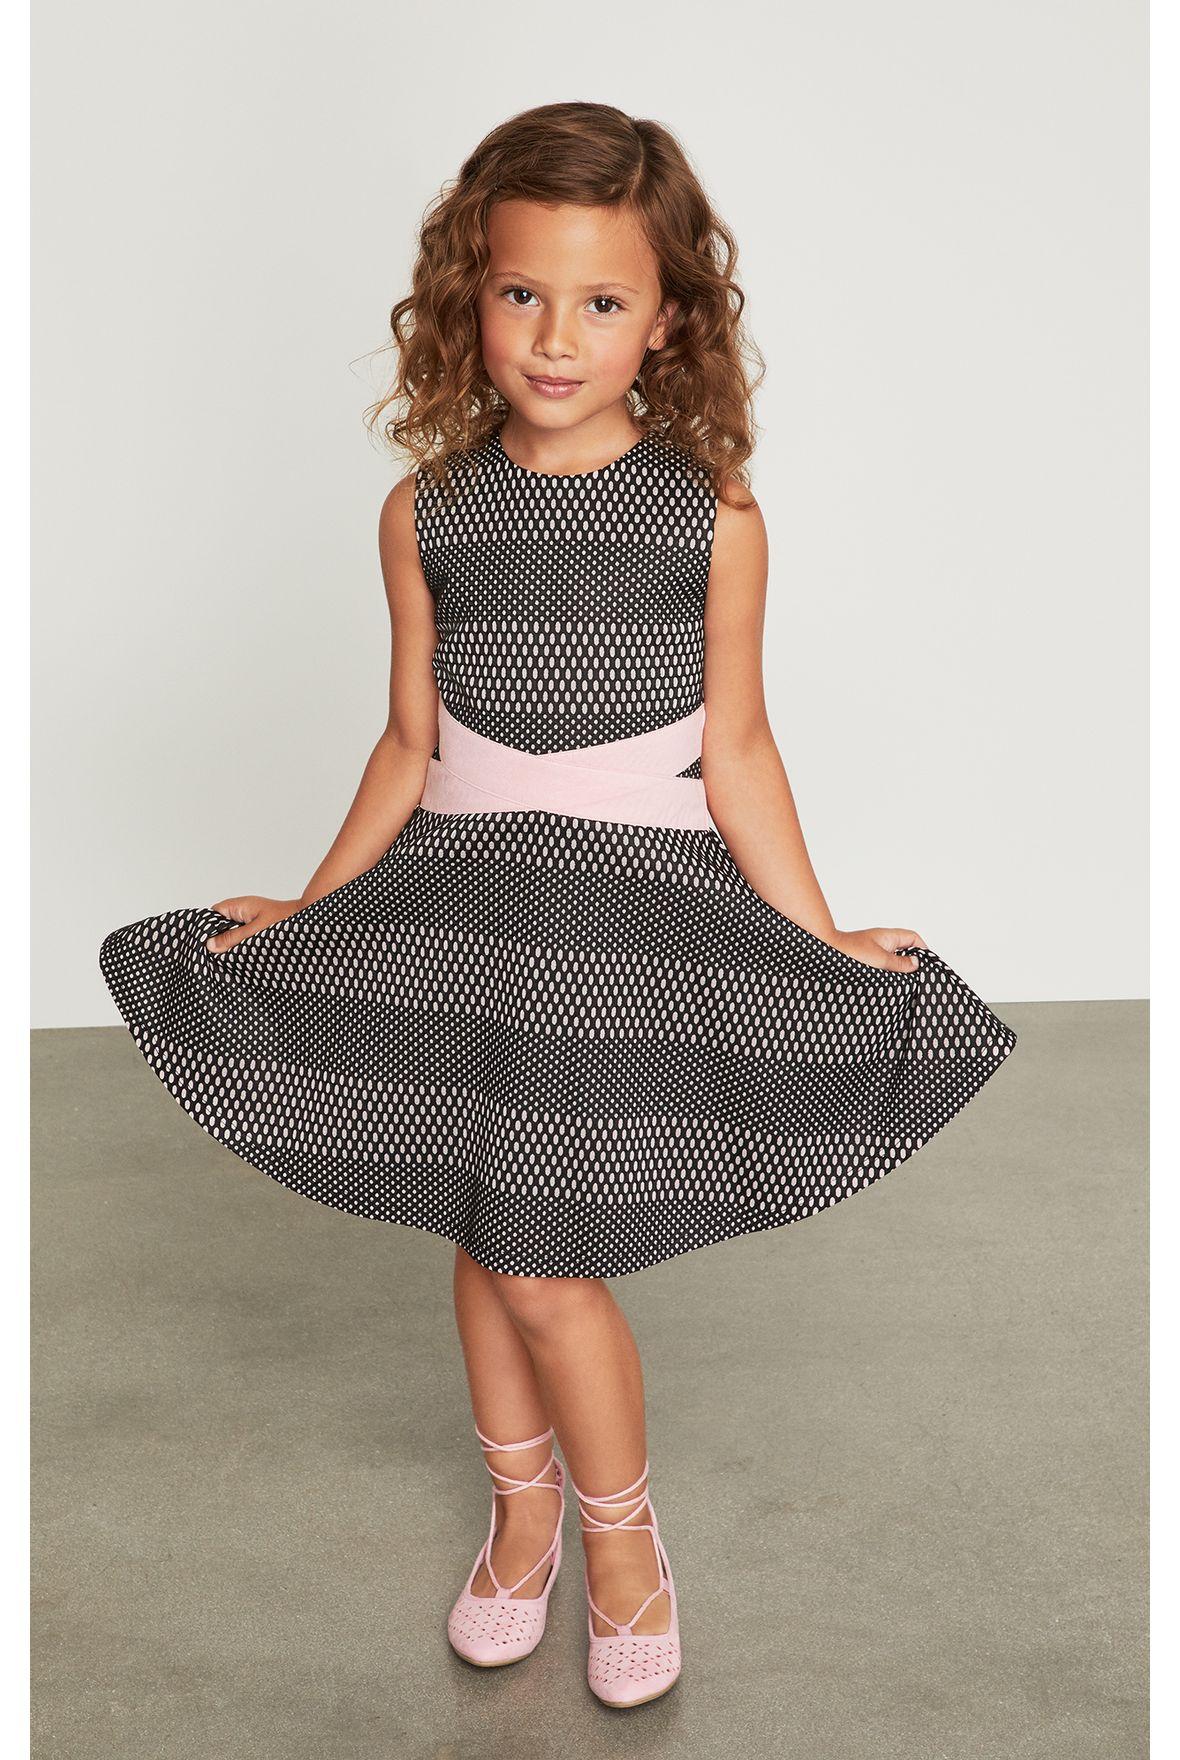 Vestido-BCBGirls-negro-con-lazo-rosa-B638DR186_BLK_c